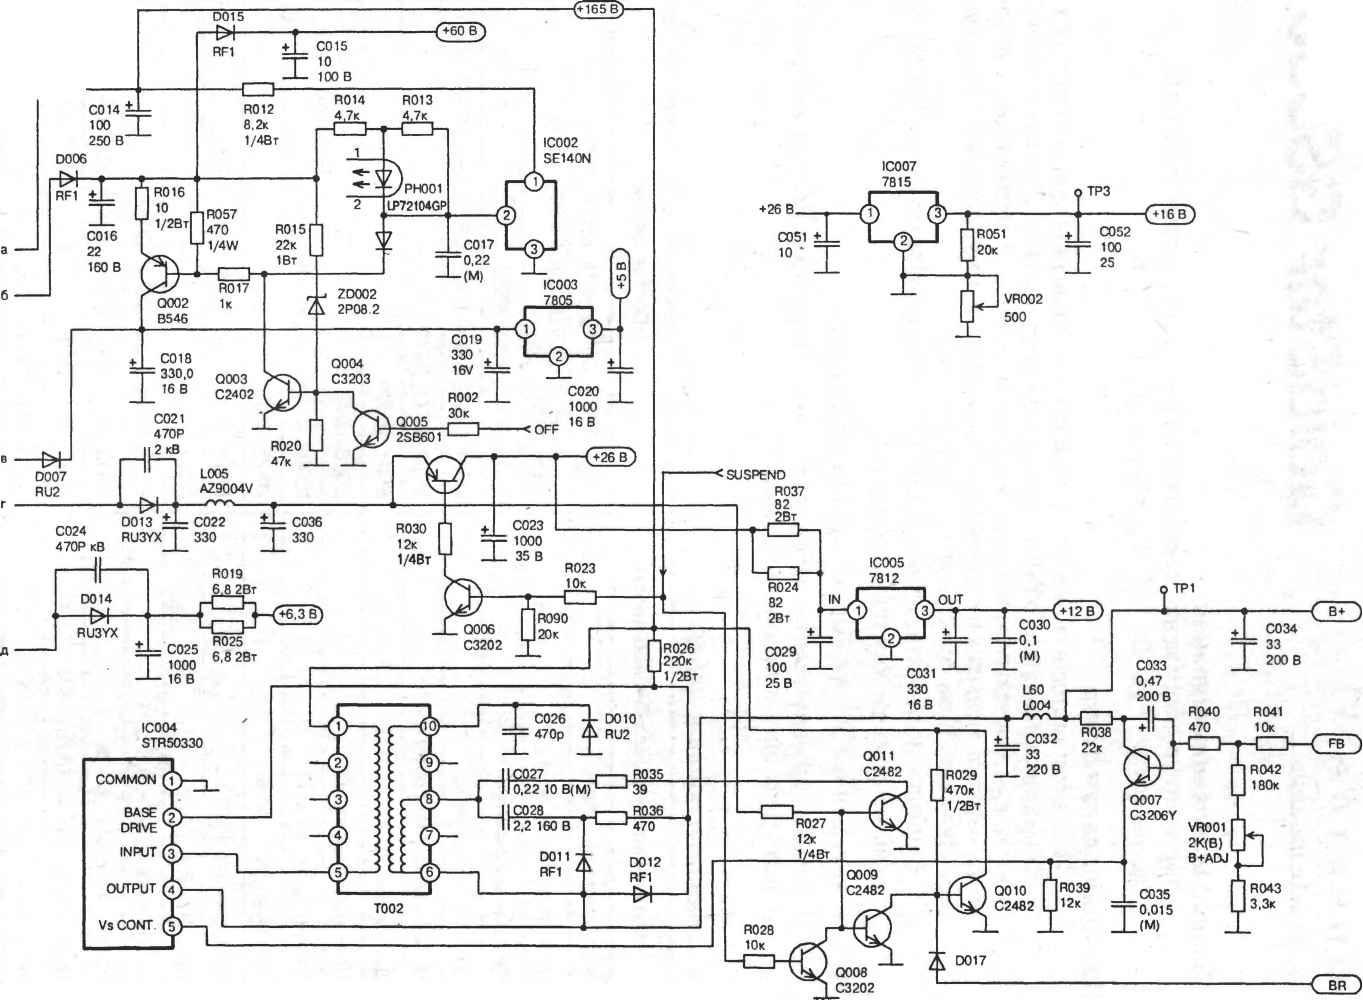 LG FLATRON MANUAL - Auto Electrical Wiring Diagram